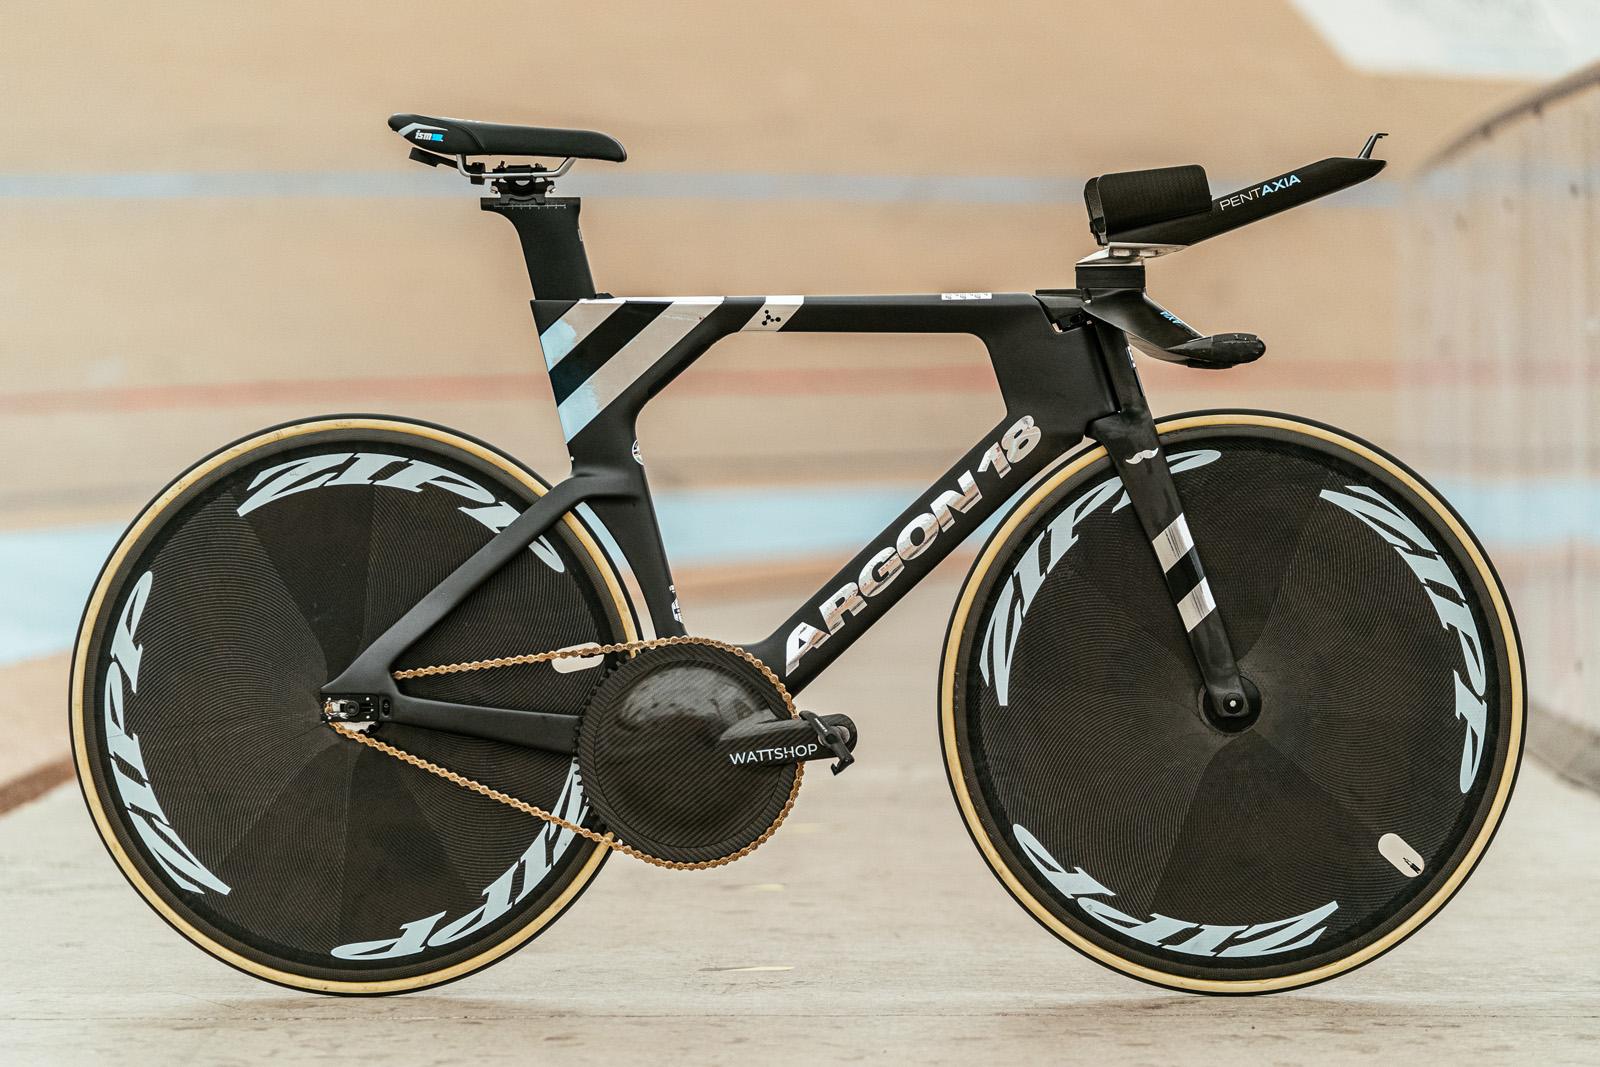 A closer look at Ashton Lambie's $30,000 record-breaking pursuit bike    Cyclingnews